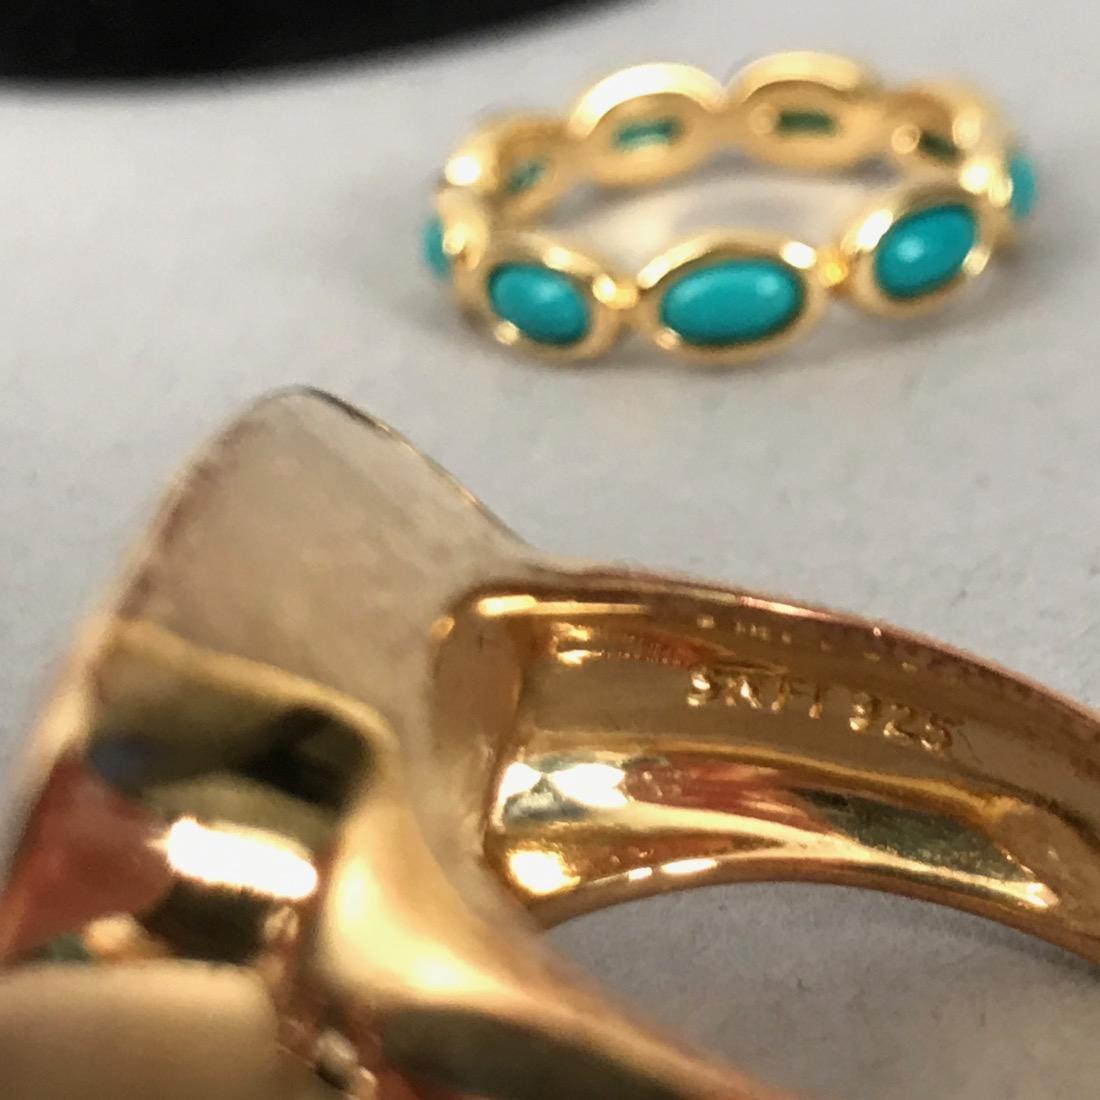 7 Sterling Silver Rings - 3